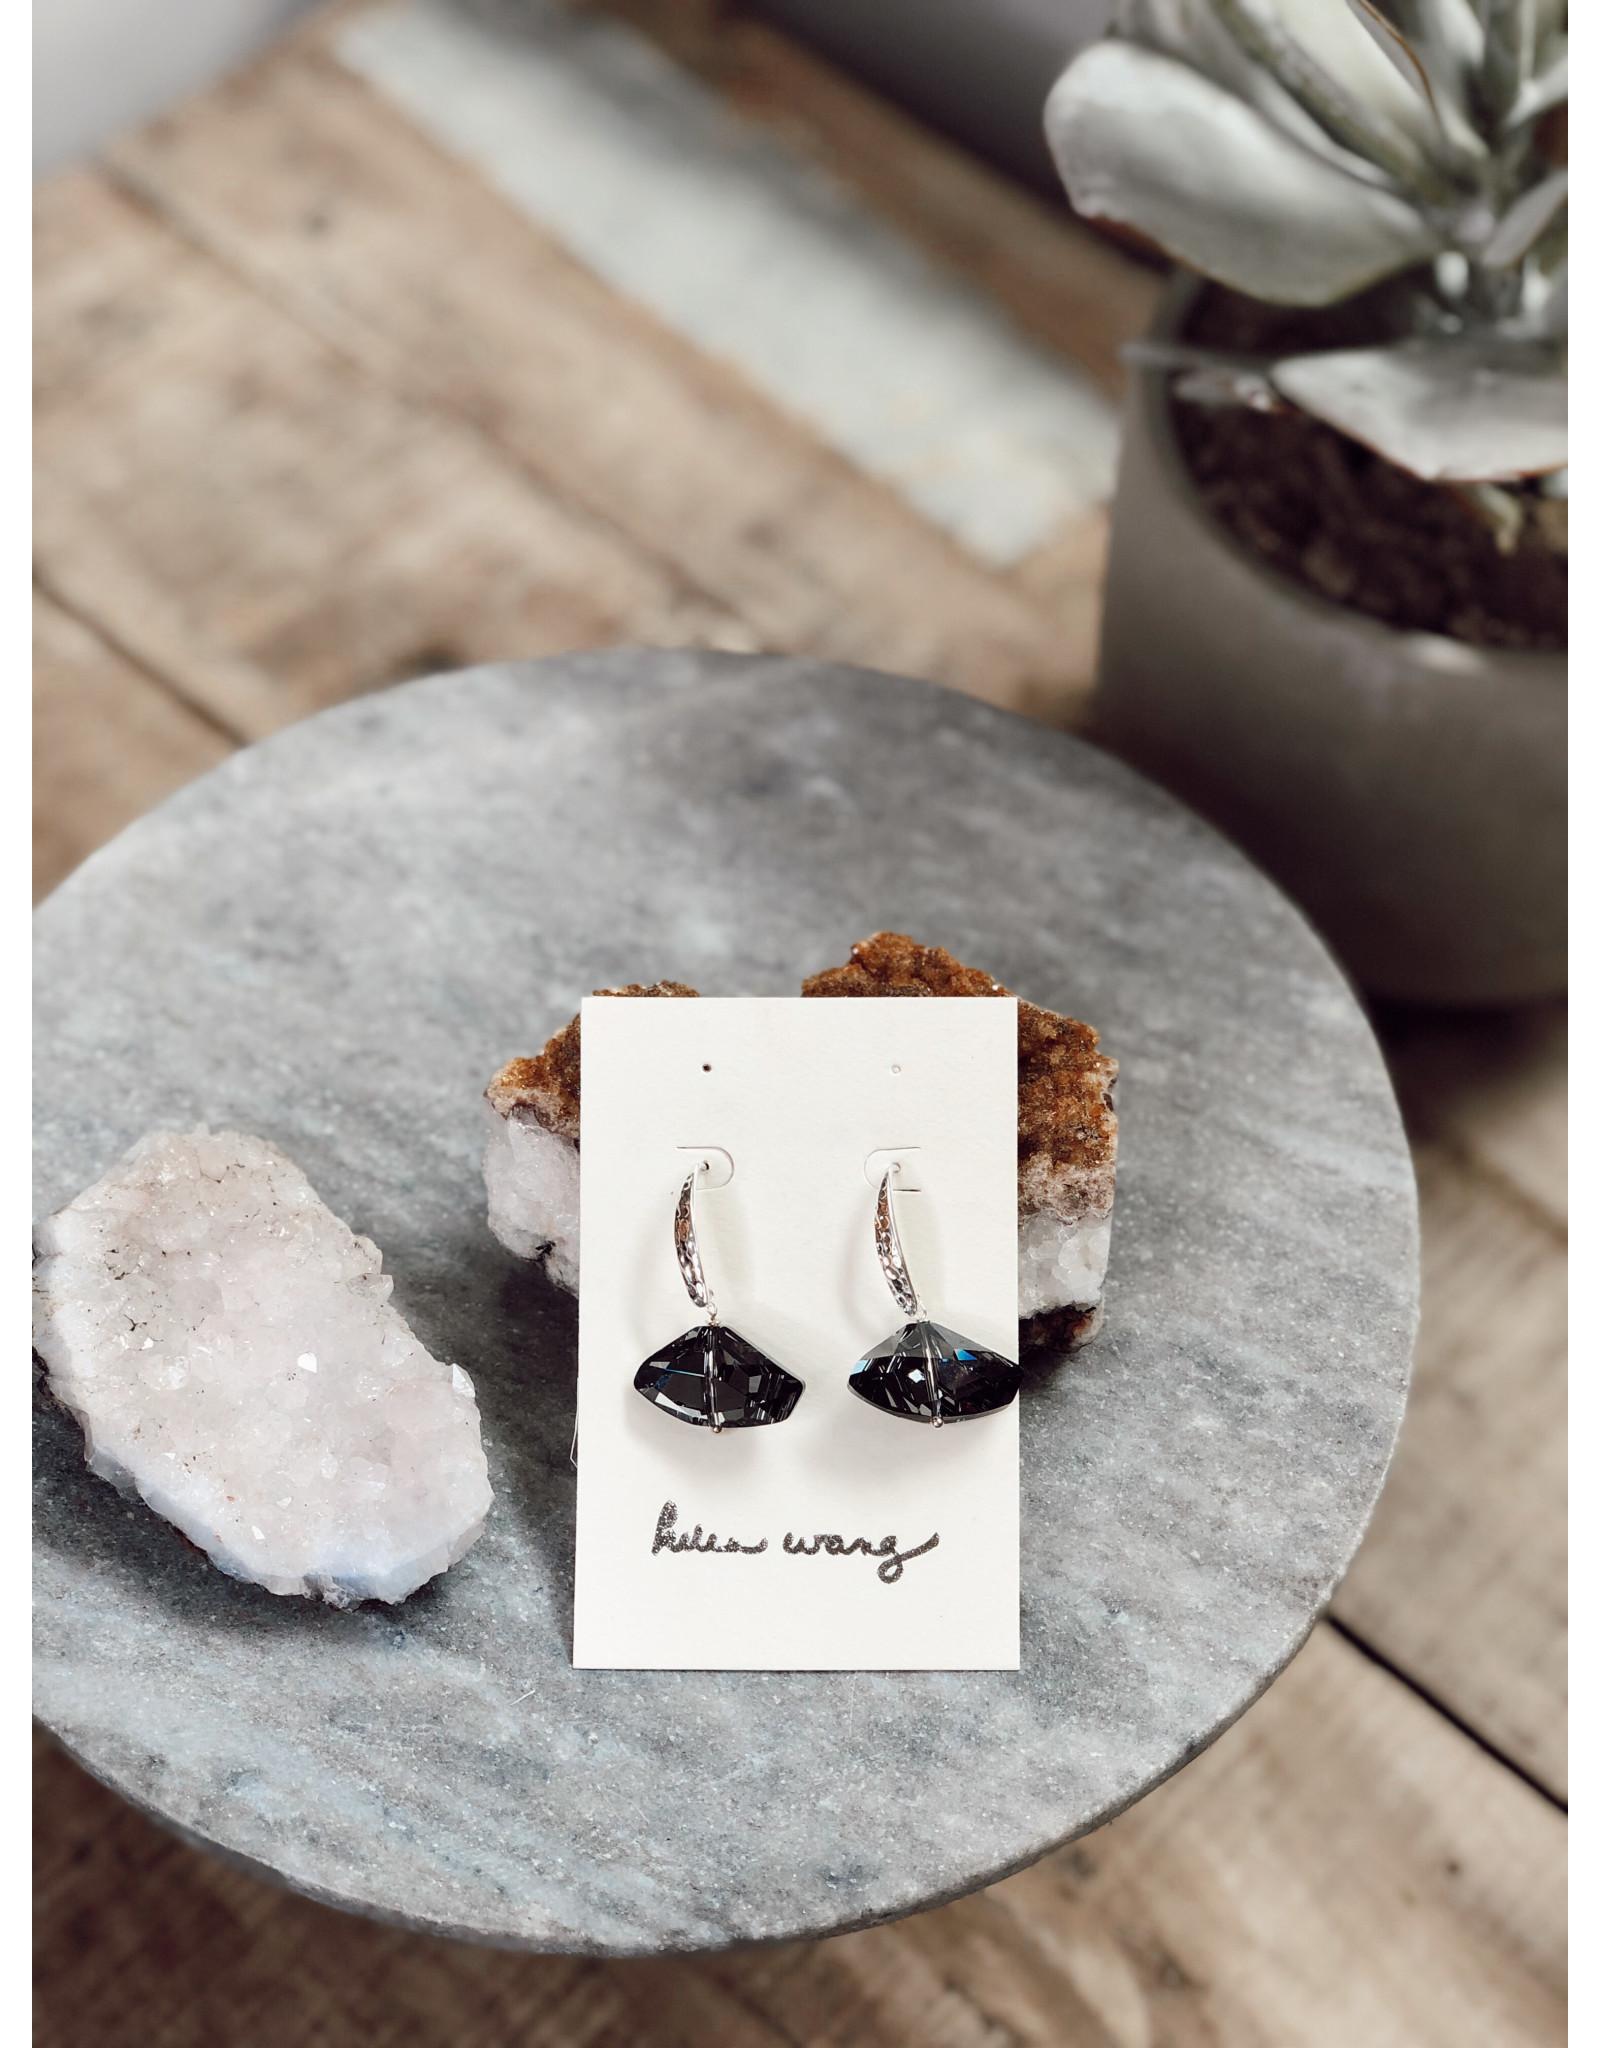 Helen Wang HW Hammered Sterling Ltd. Edition Swarovski Crystal Earrings